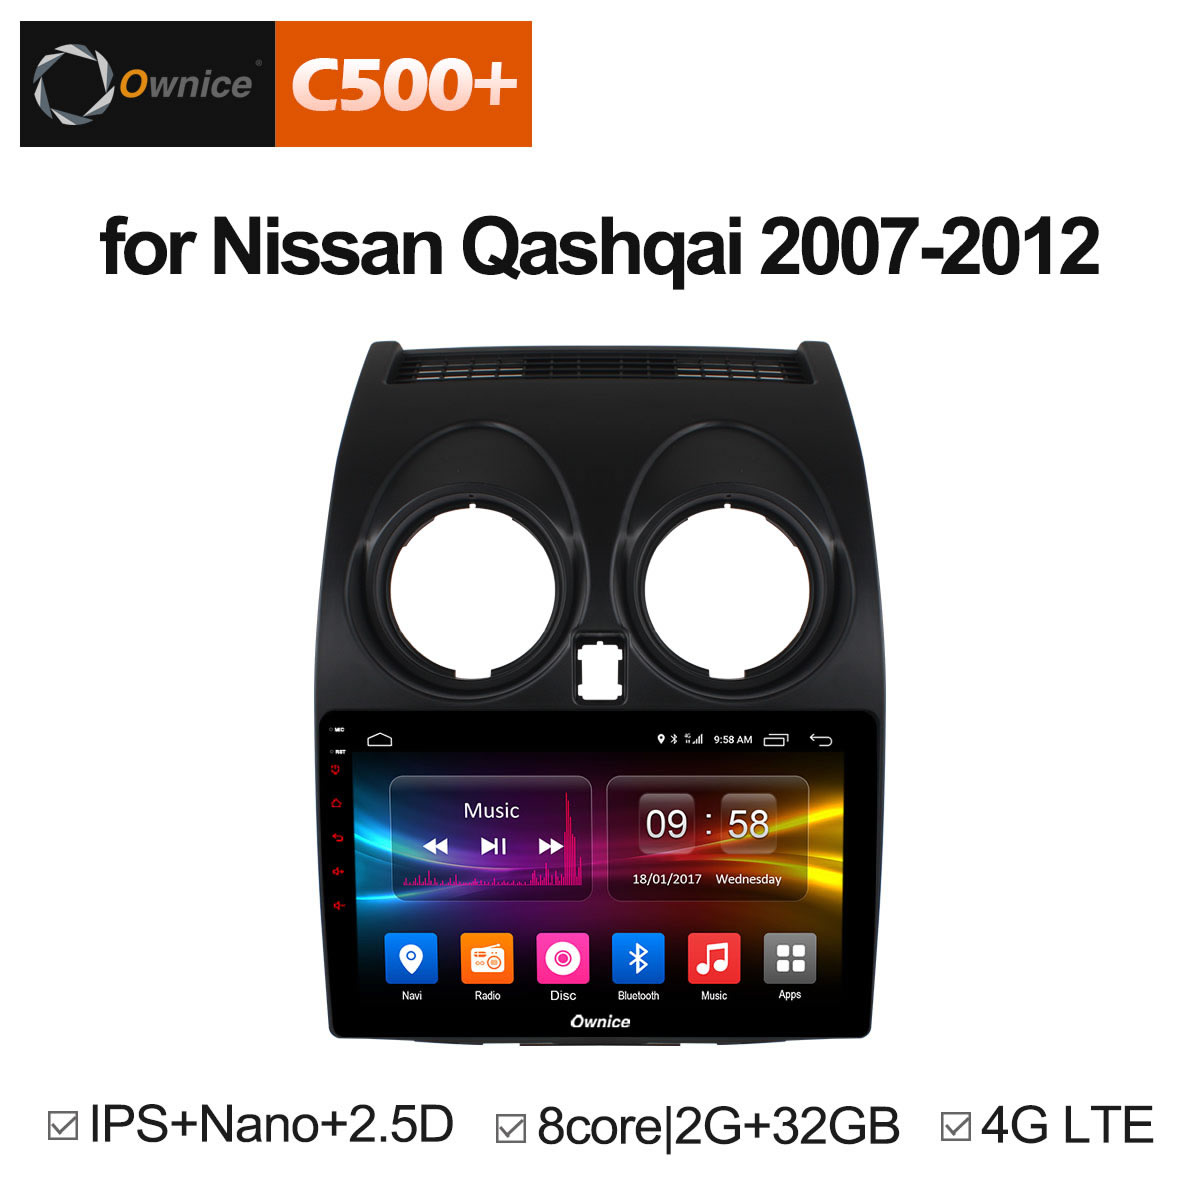 Штатная магнитола CARMEDIA OL-9662-8 (C500+) Nissan Qashqai 2006-2013 ourspop mk823 quad core android 4 2 google tv player w 2gb ram 8gb rom measy rc11 air mouse eu